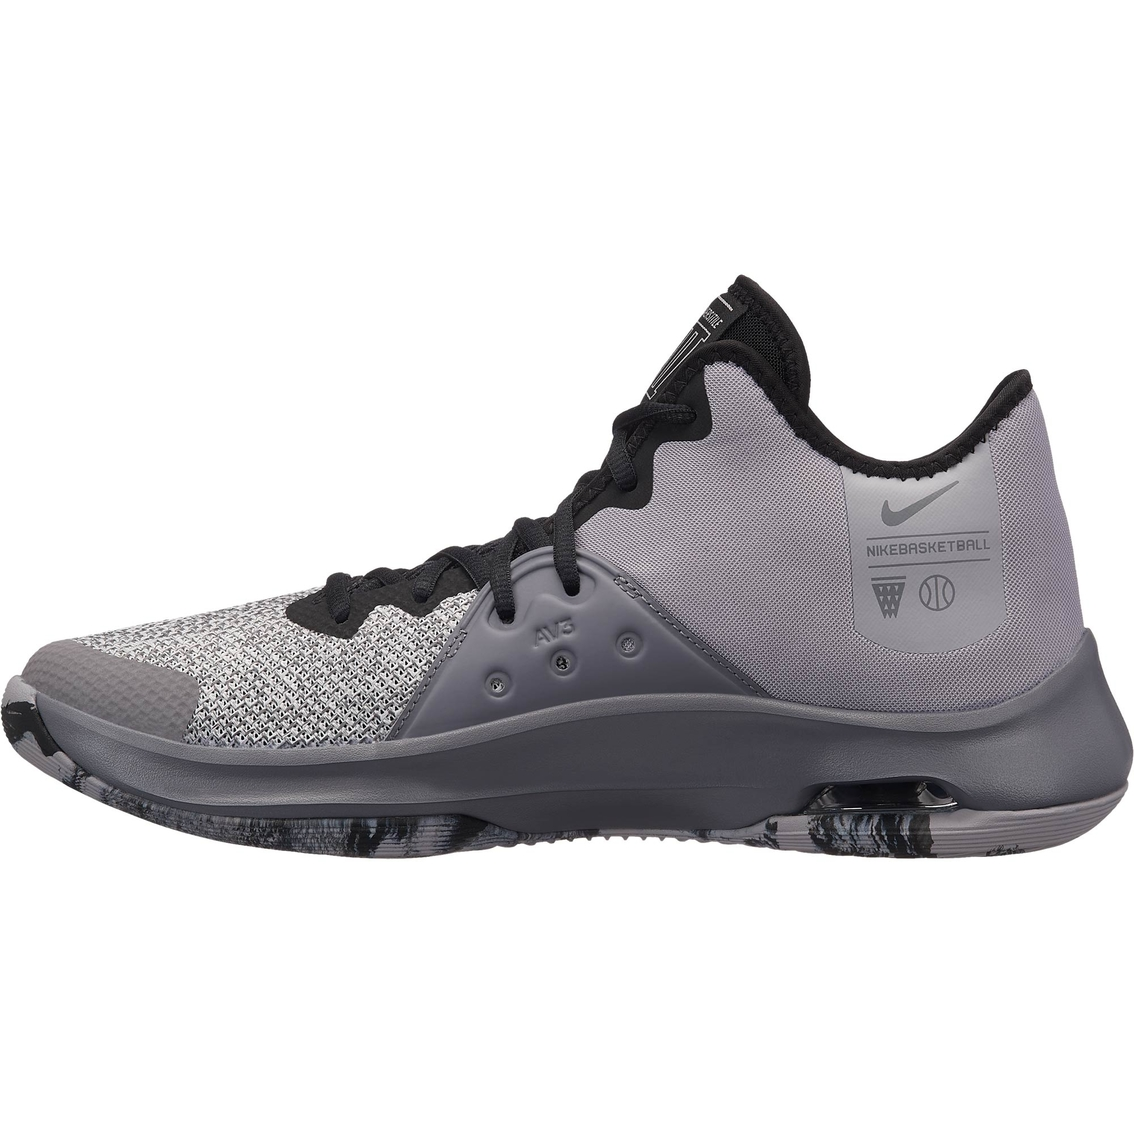 watch 534d8 51de9 Nike Men s Versitile III Basketball Shoes